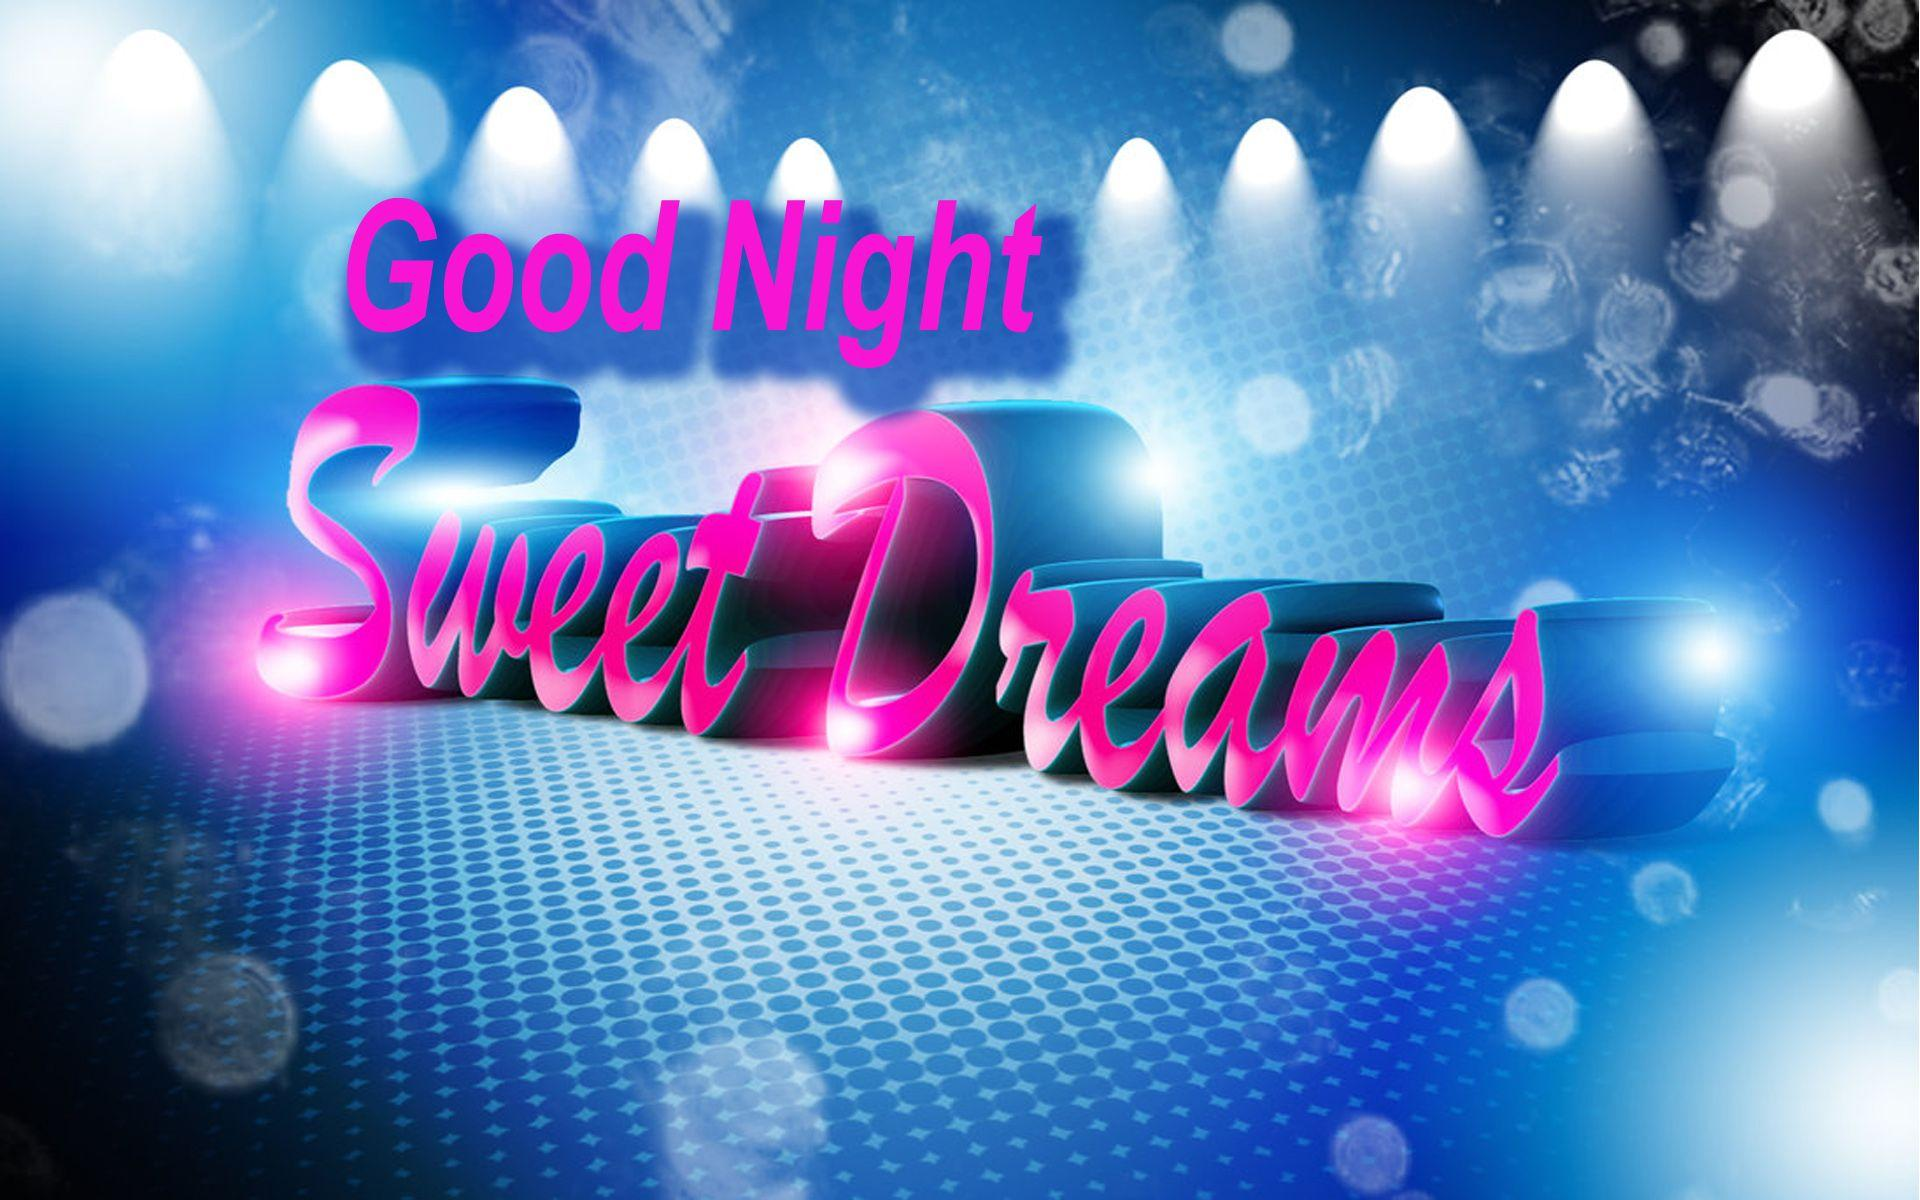 Romantic Good Night Wallpapers Wallpaper Cave